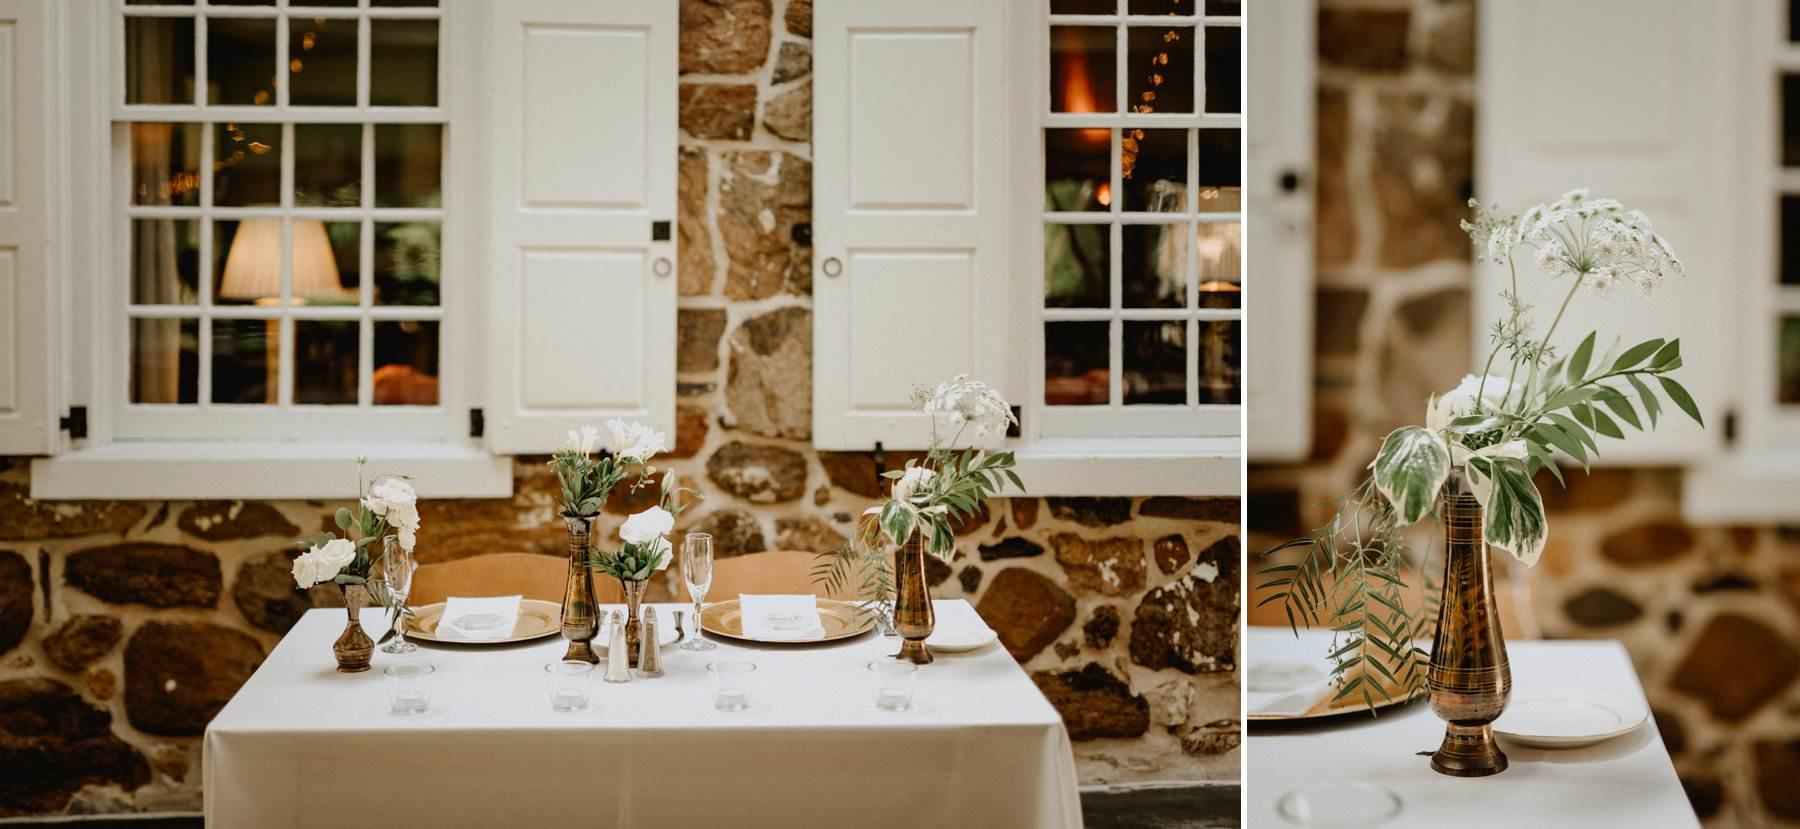 Appleford-estate-wedding-74.jpg